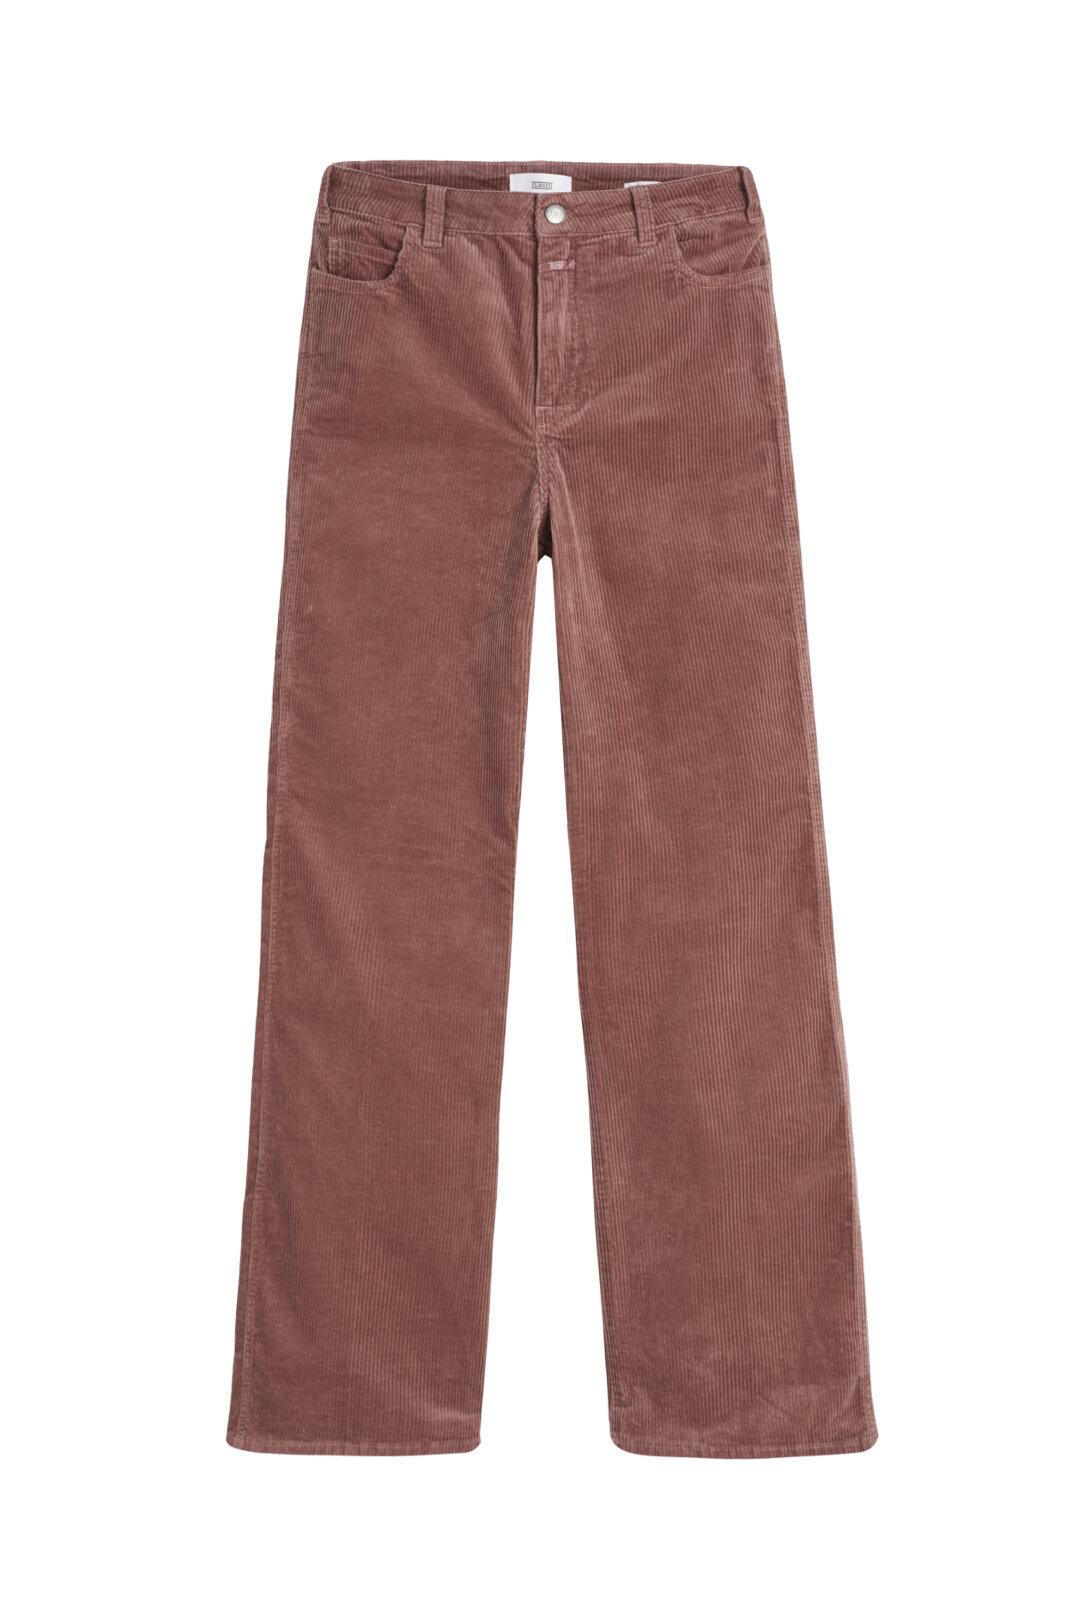 Pantalon velours côtelé Kathy